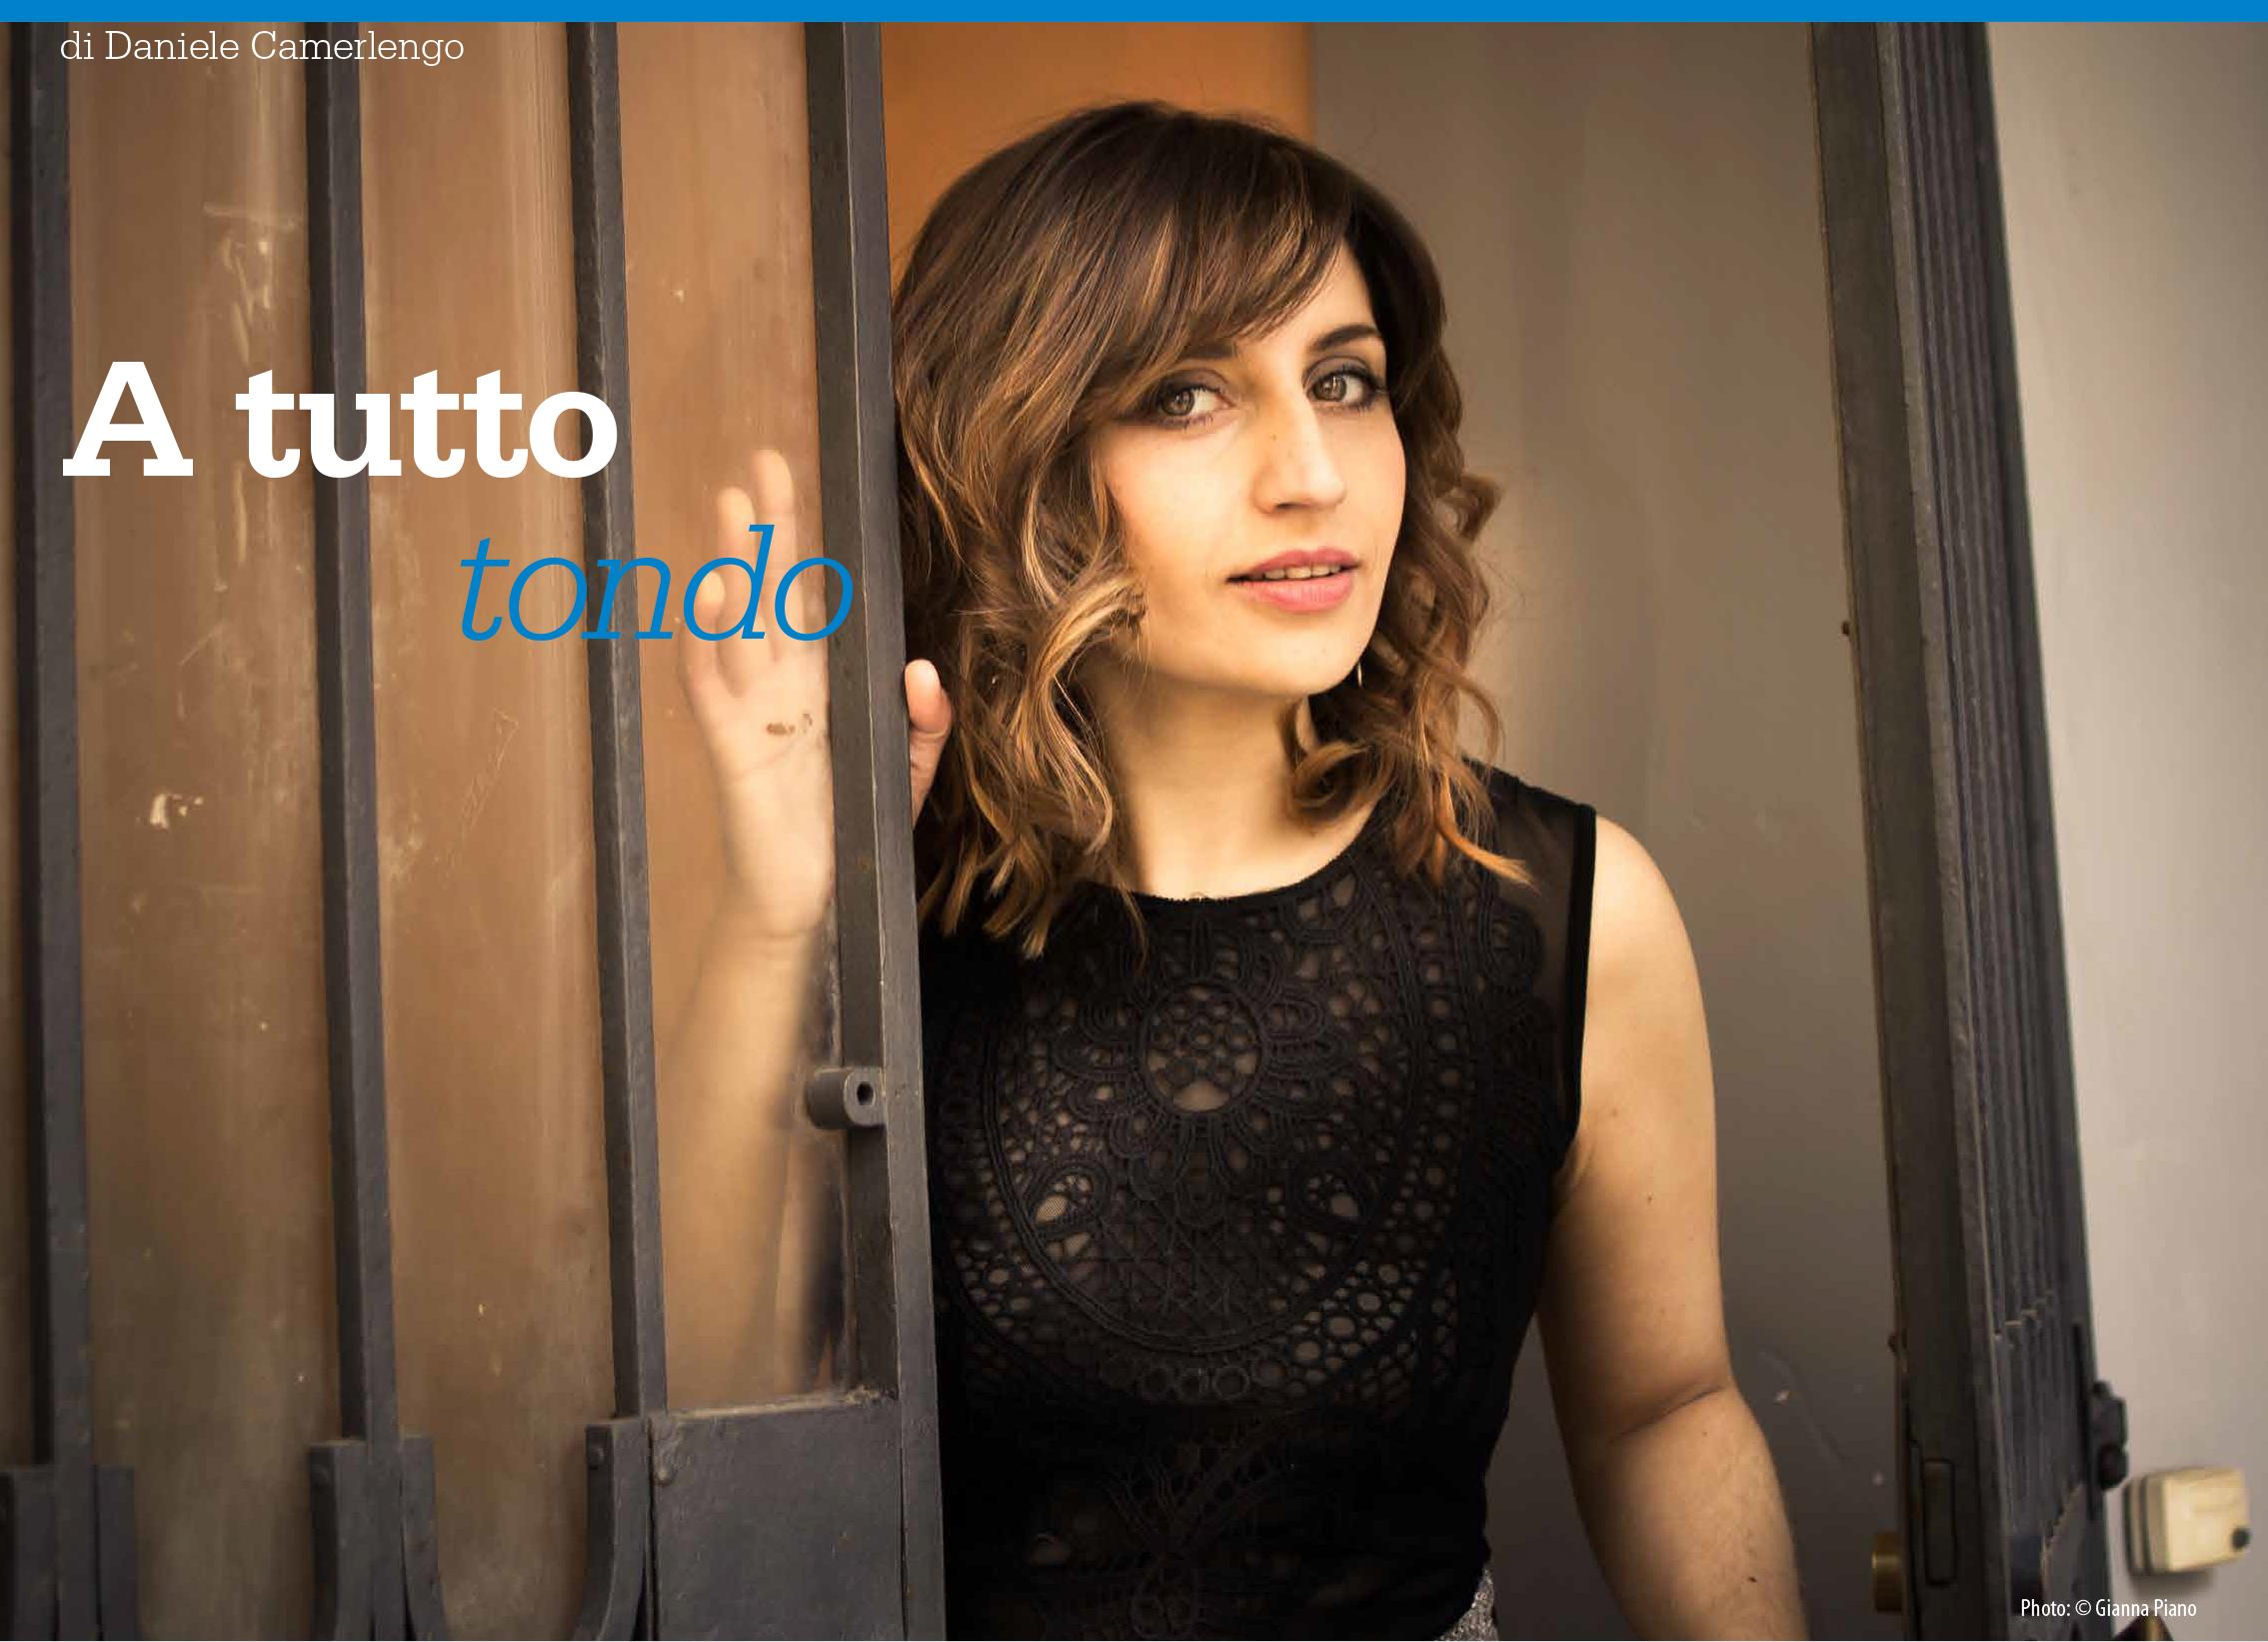 FEATURE: Chiara Izzi in SUONO Magazine (Italy)